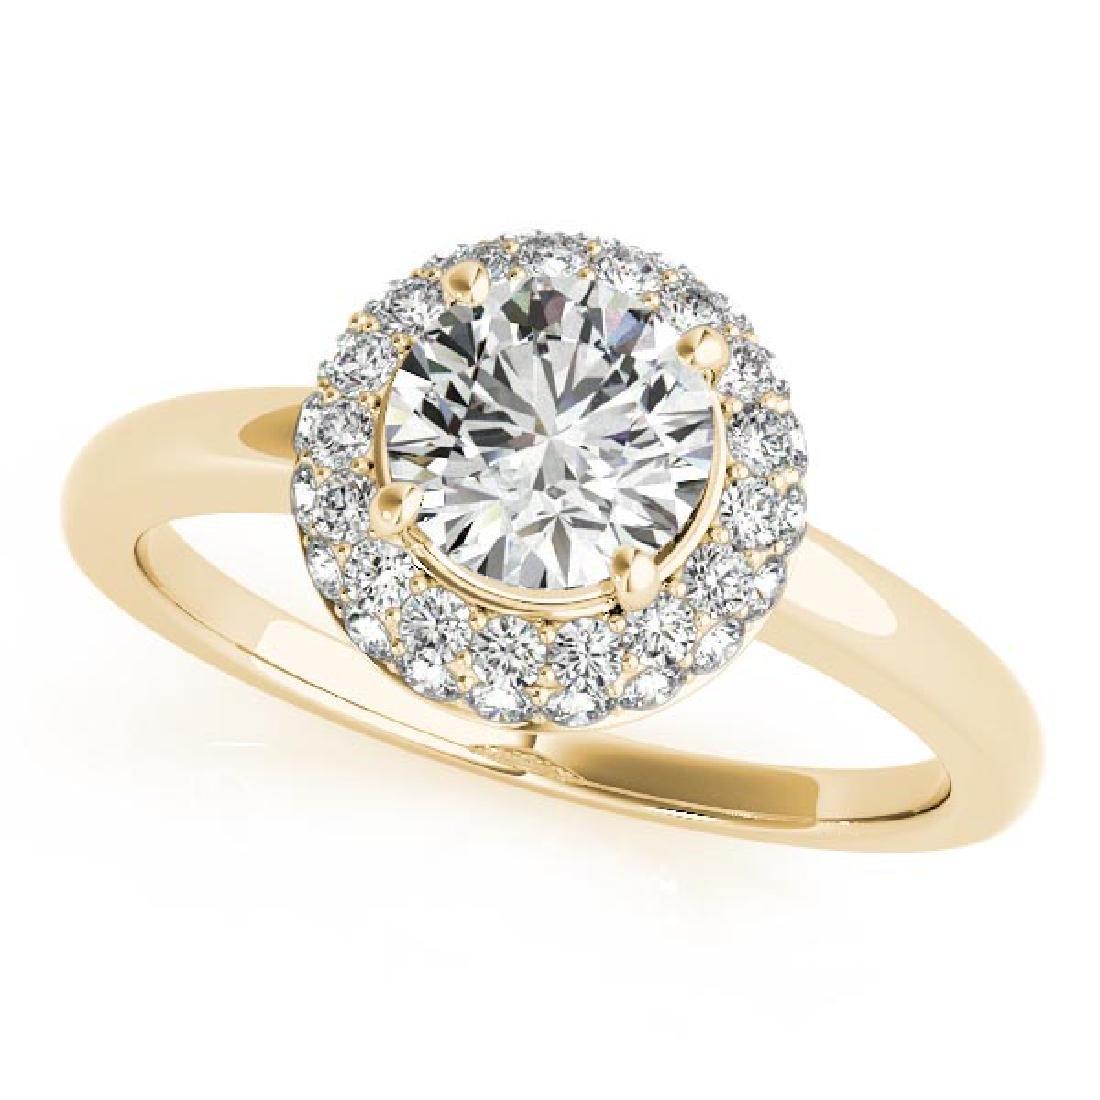 CERTIFIED 18K YELLOW GOLD 1.45 CT G-H/VS-SI1 DIAMOND HA